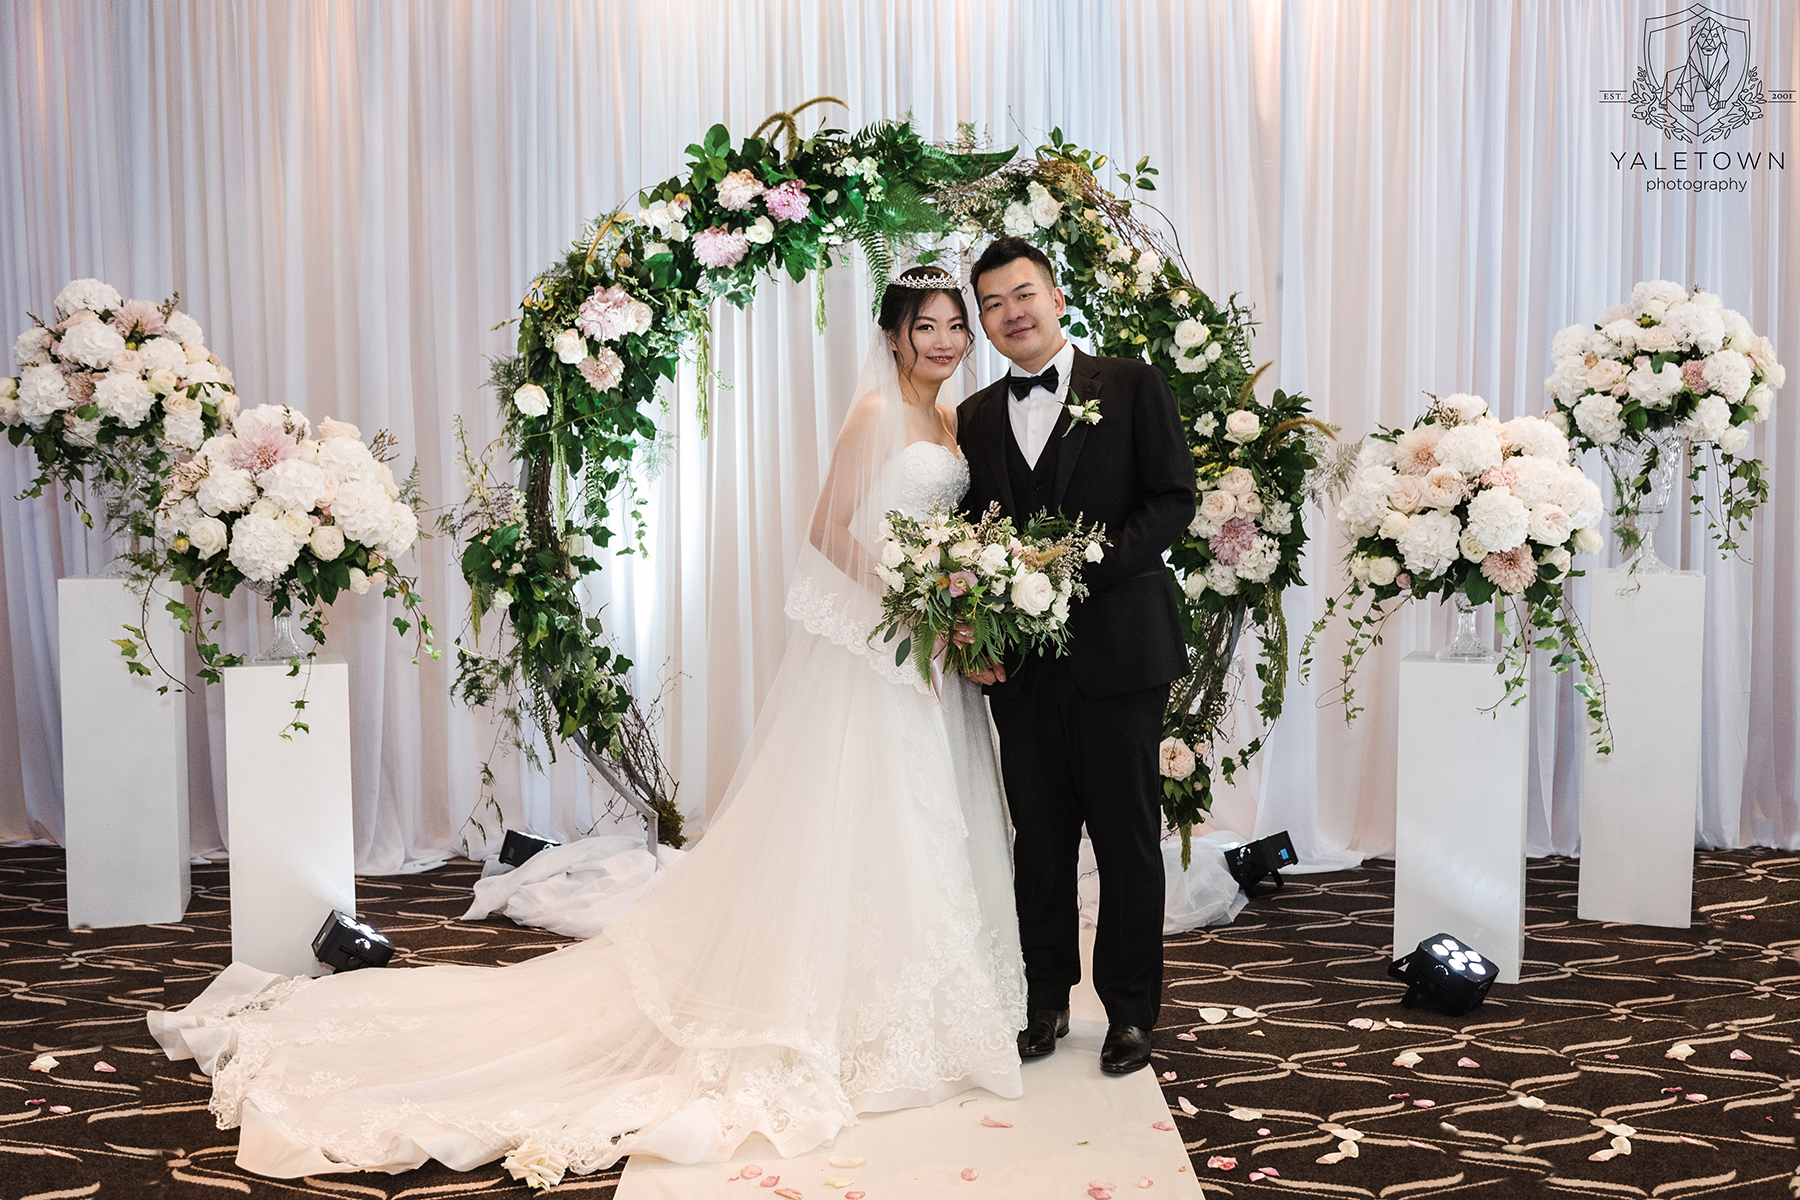 Bride-Groom-Rosewood-Hotel-Georgia-Vancouver-Wedding-Yaletown-Photography-photo